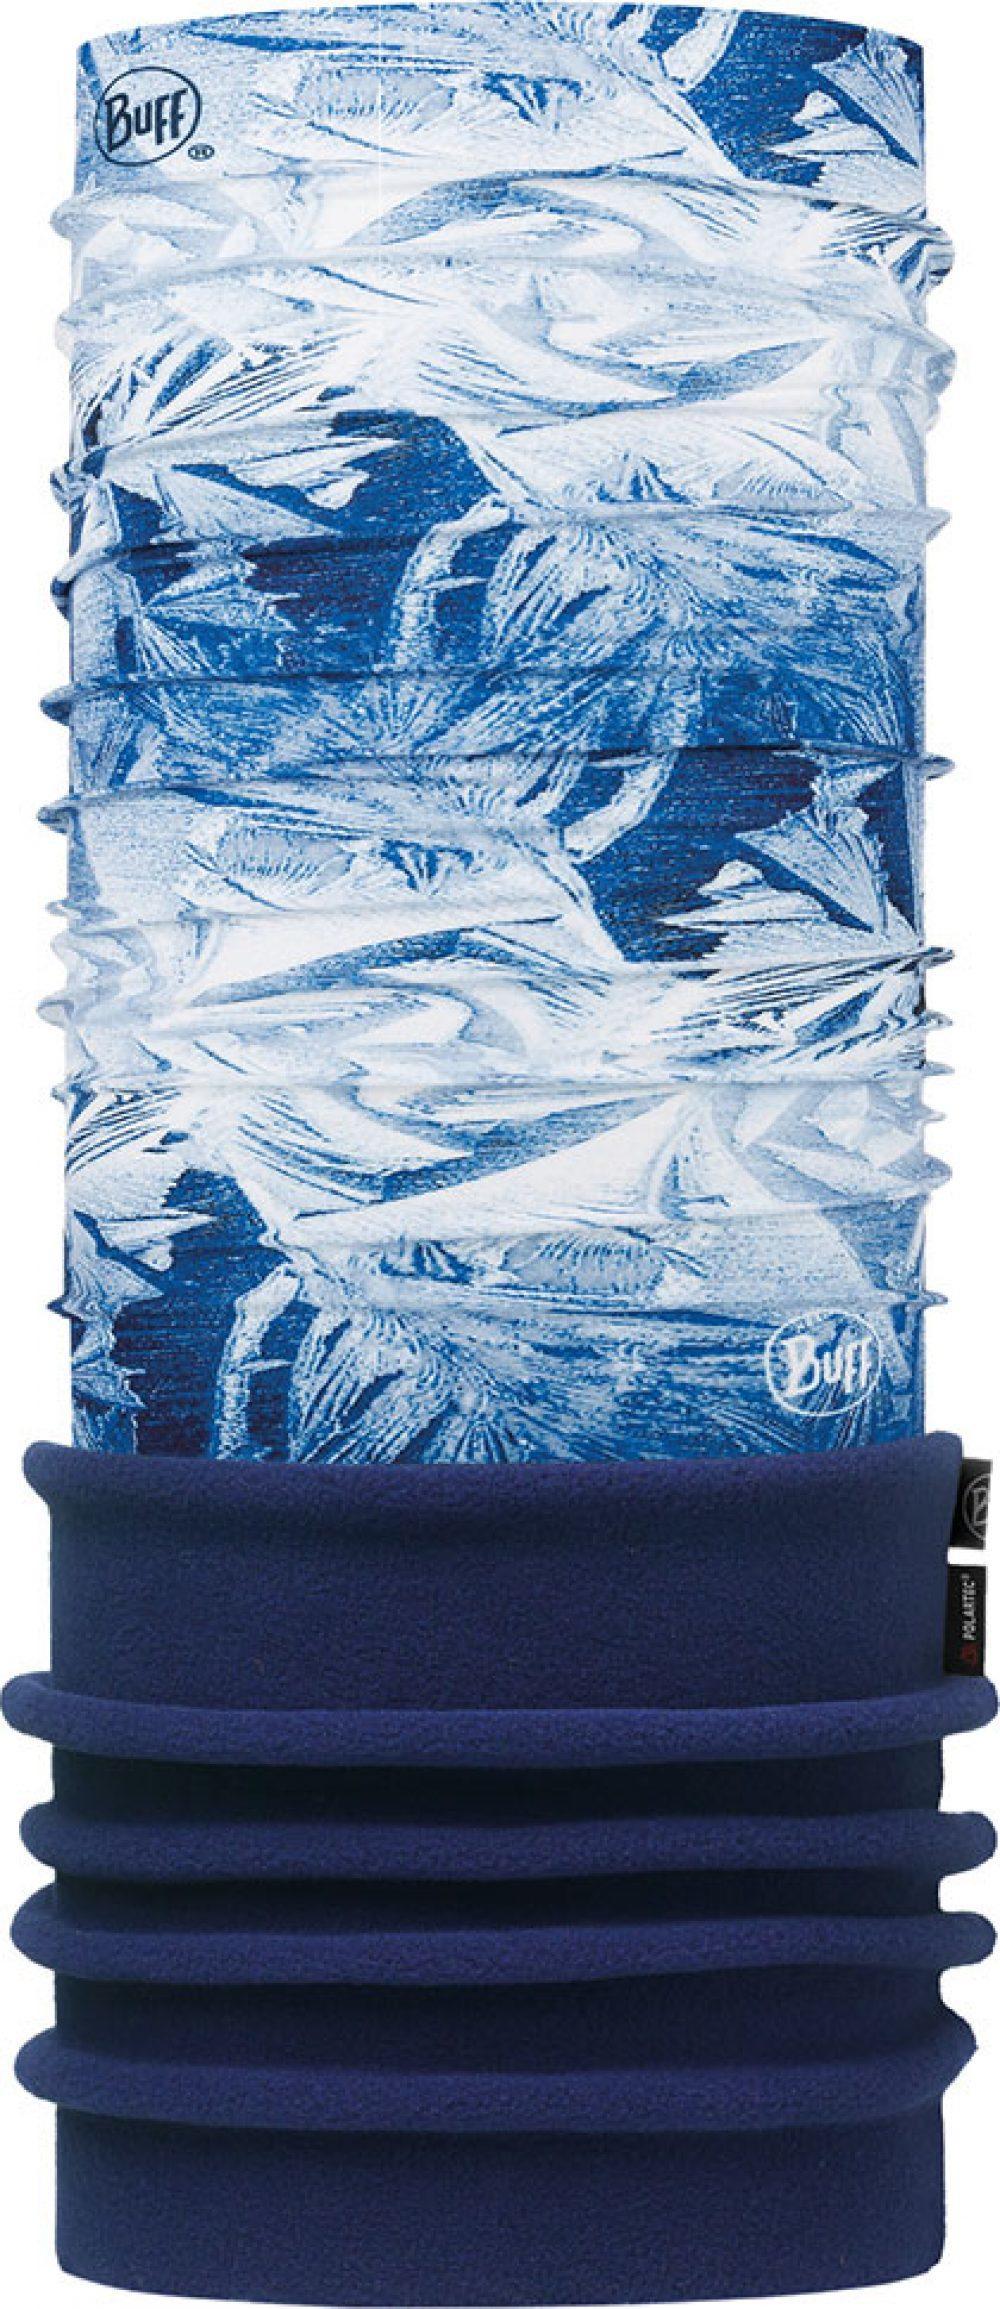 "Studio photo of the Polar Buff® Design ""Frost Blue"". Source: buff.eu"